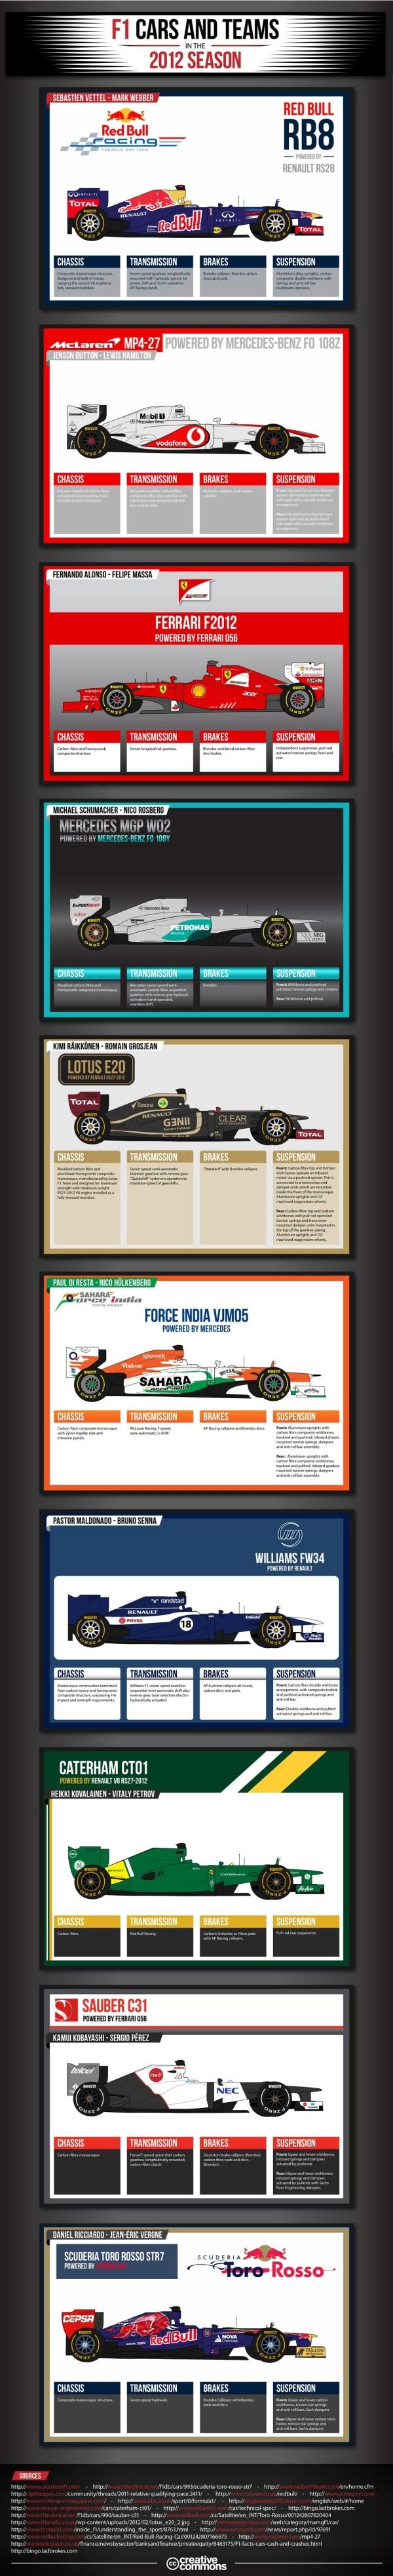 F1 Cars and Teams